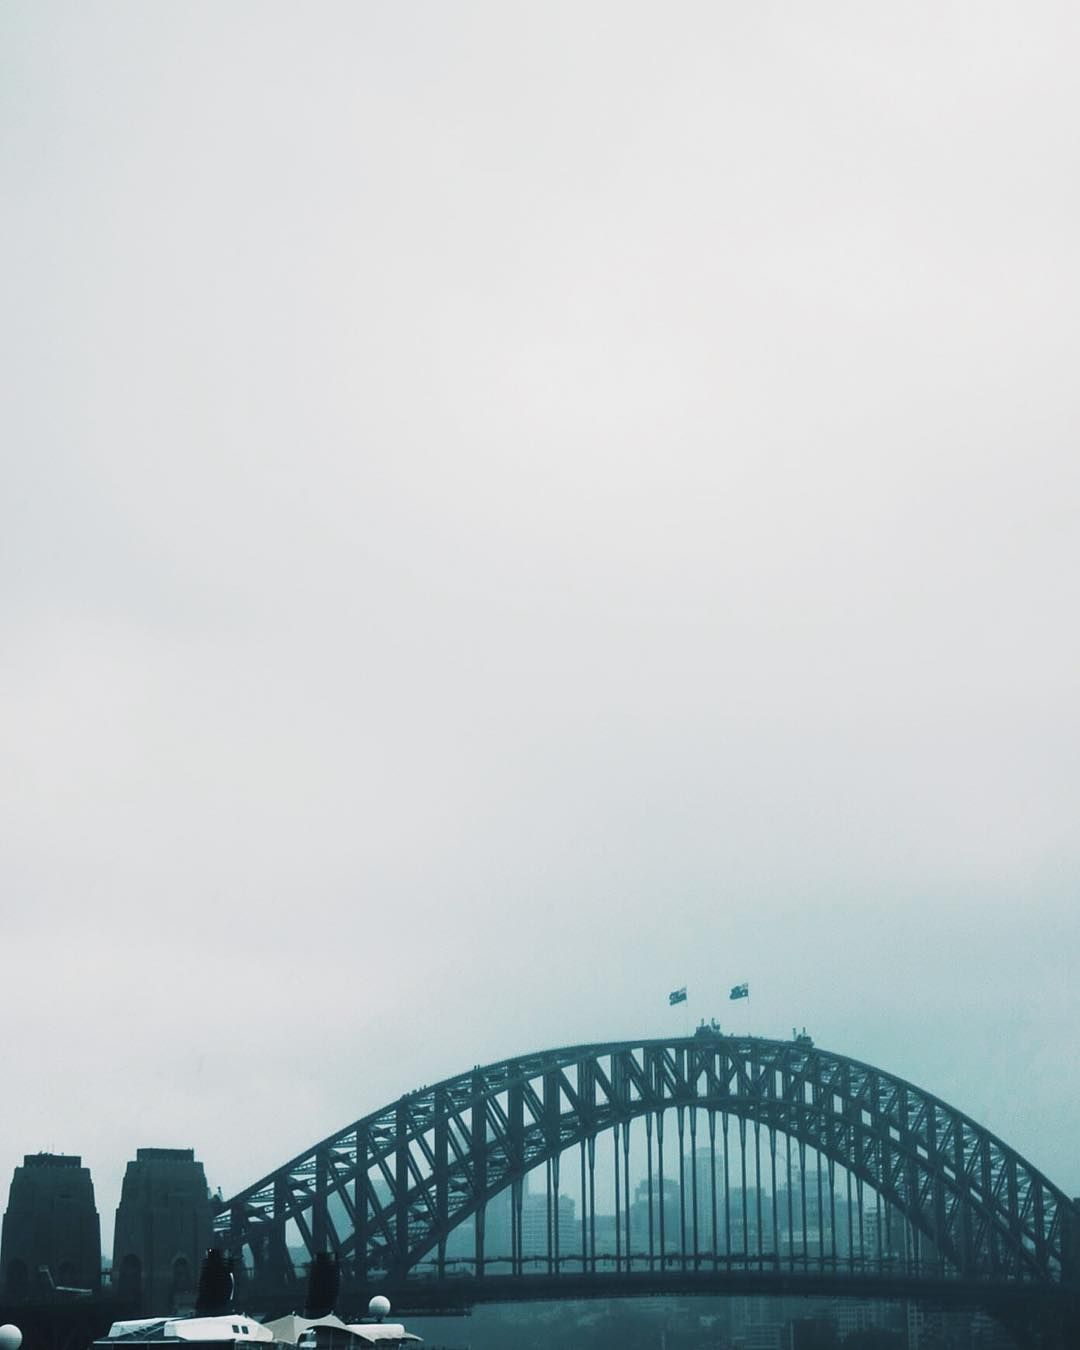 Pin by Destination Australia on Sydney Harbour Bridge | Pinterest ...